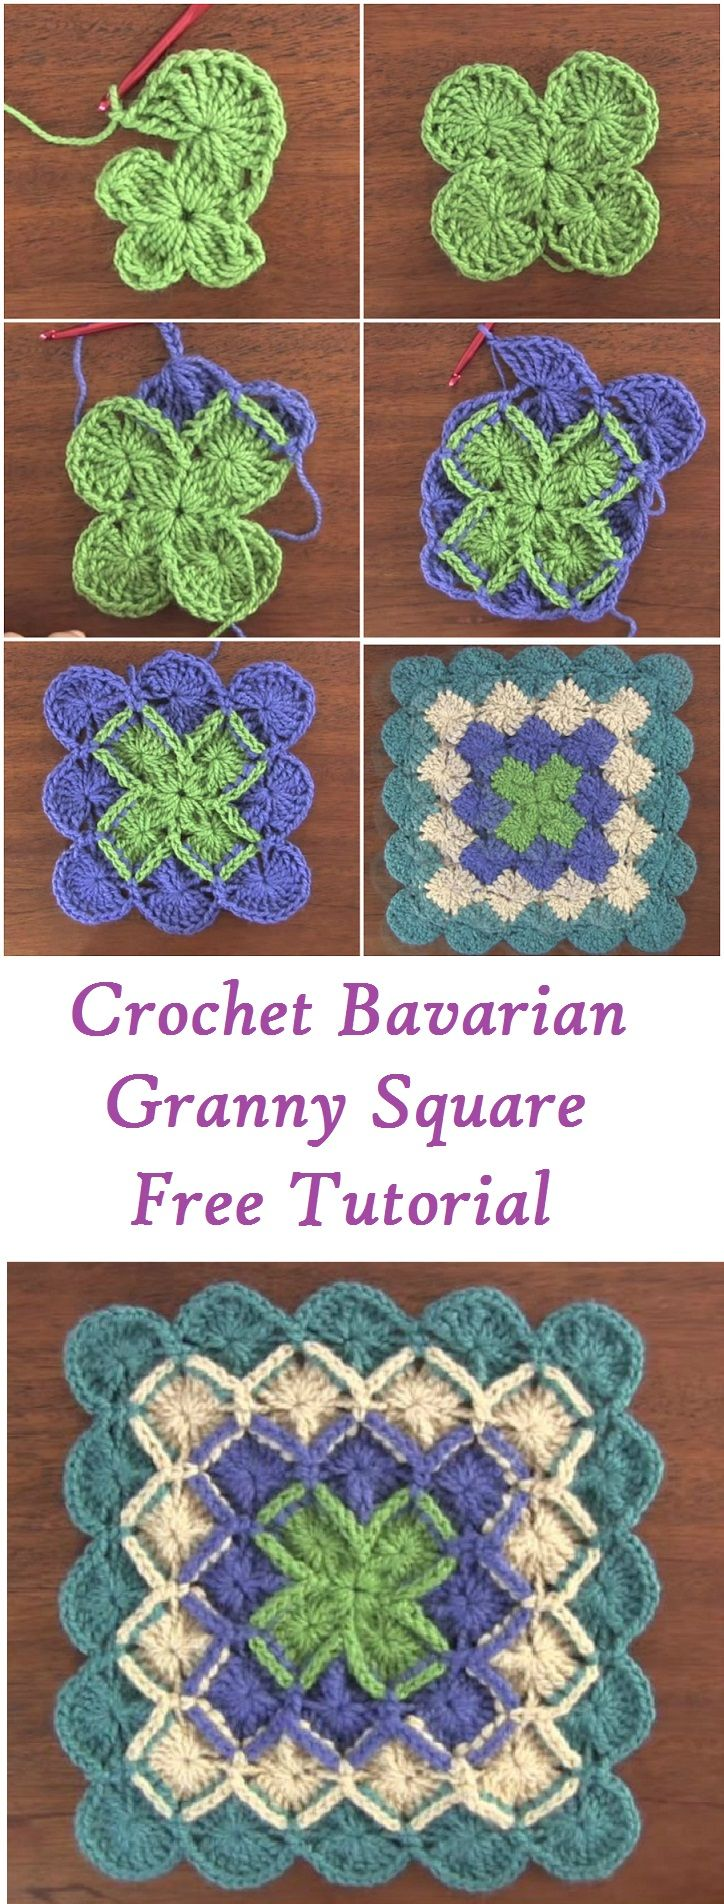 Crochet Bavarian Granny Square Free Tutorial | Quadrati | Pinterest ...